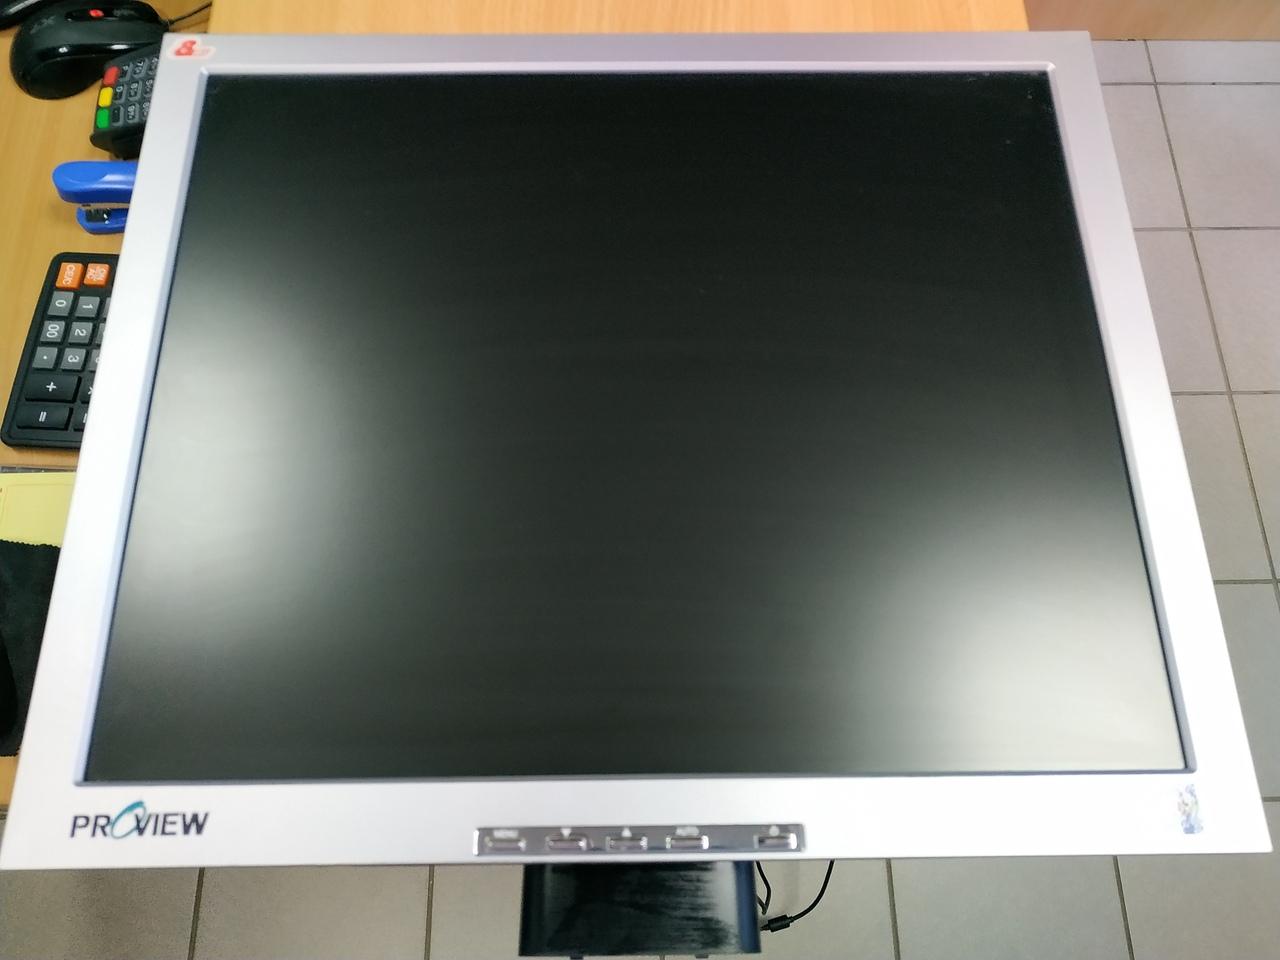 монитор Proview 700P   фото 1 из 1